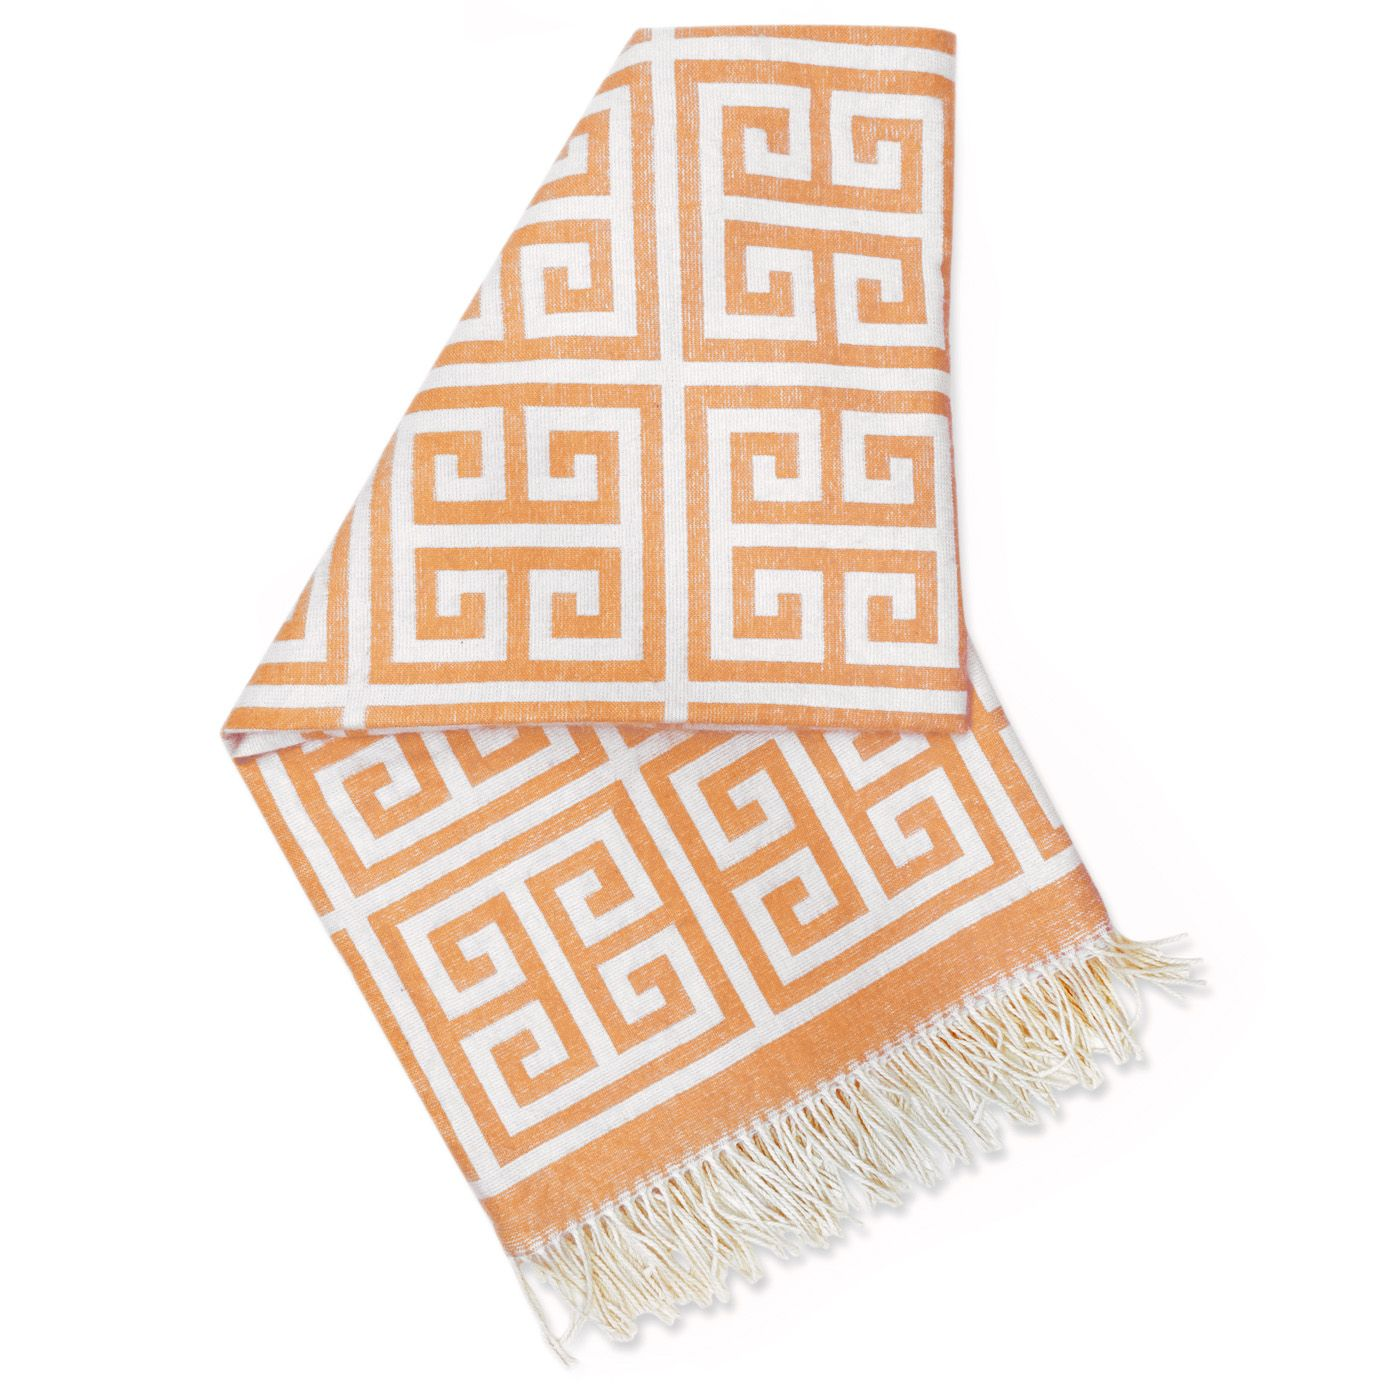 Jonathan Adler Modern Blankets And Throws Orange Greek Key Alpaca Throw In Throws Alpaca Throw Modern Throw